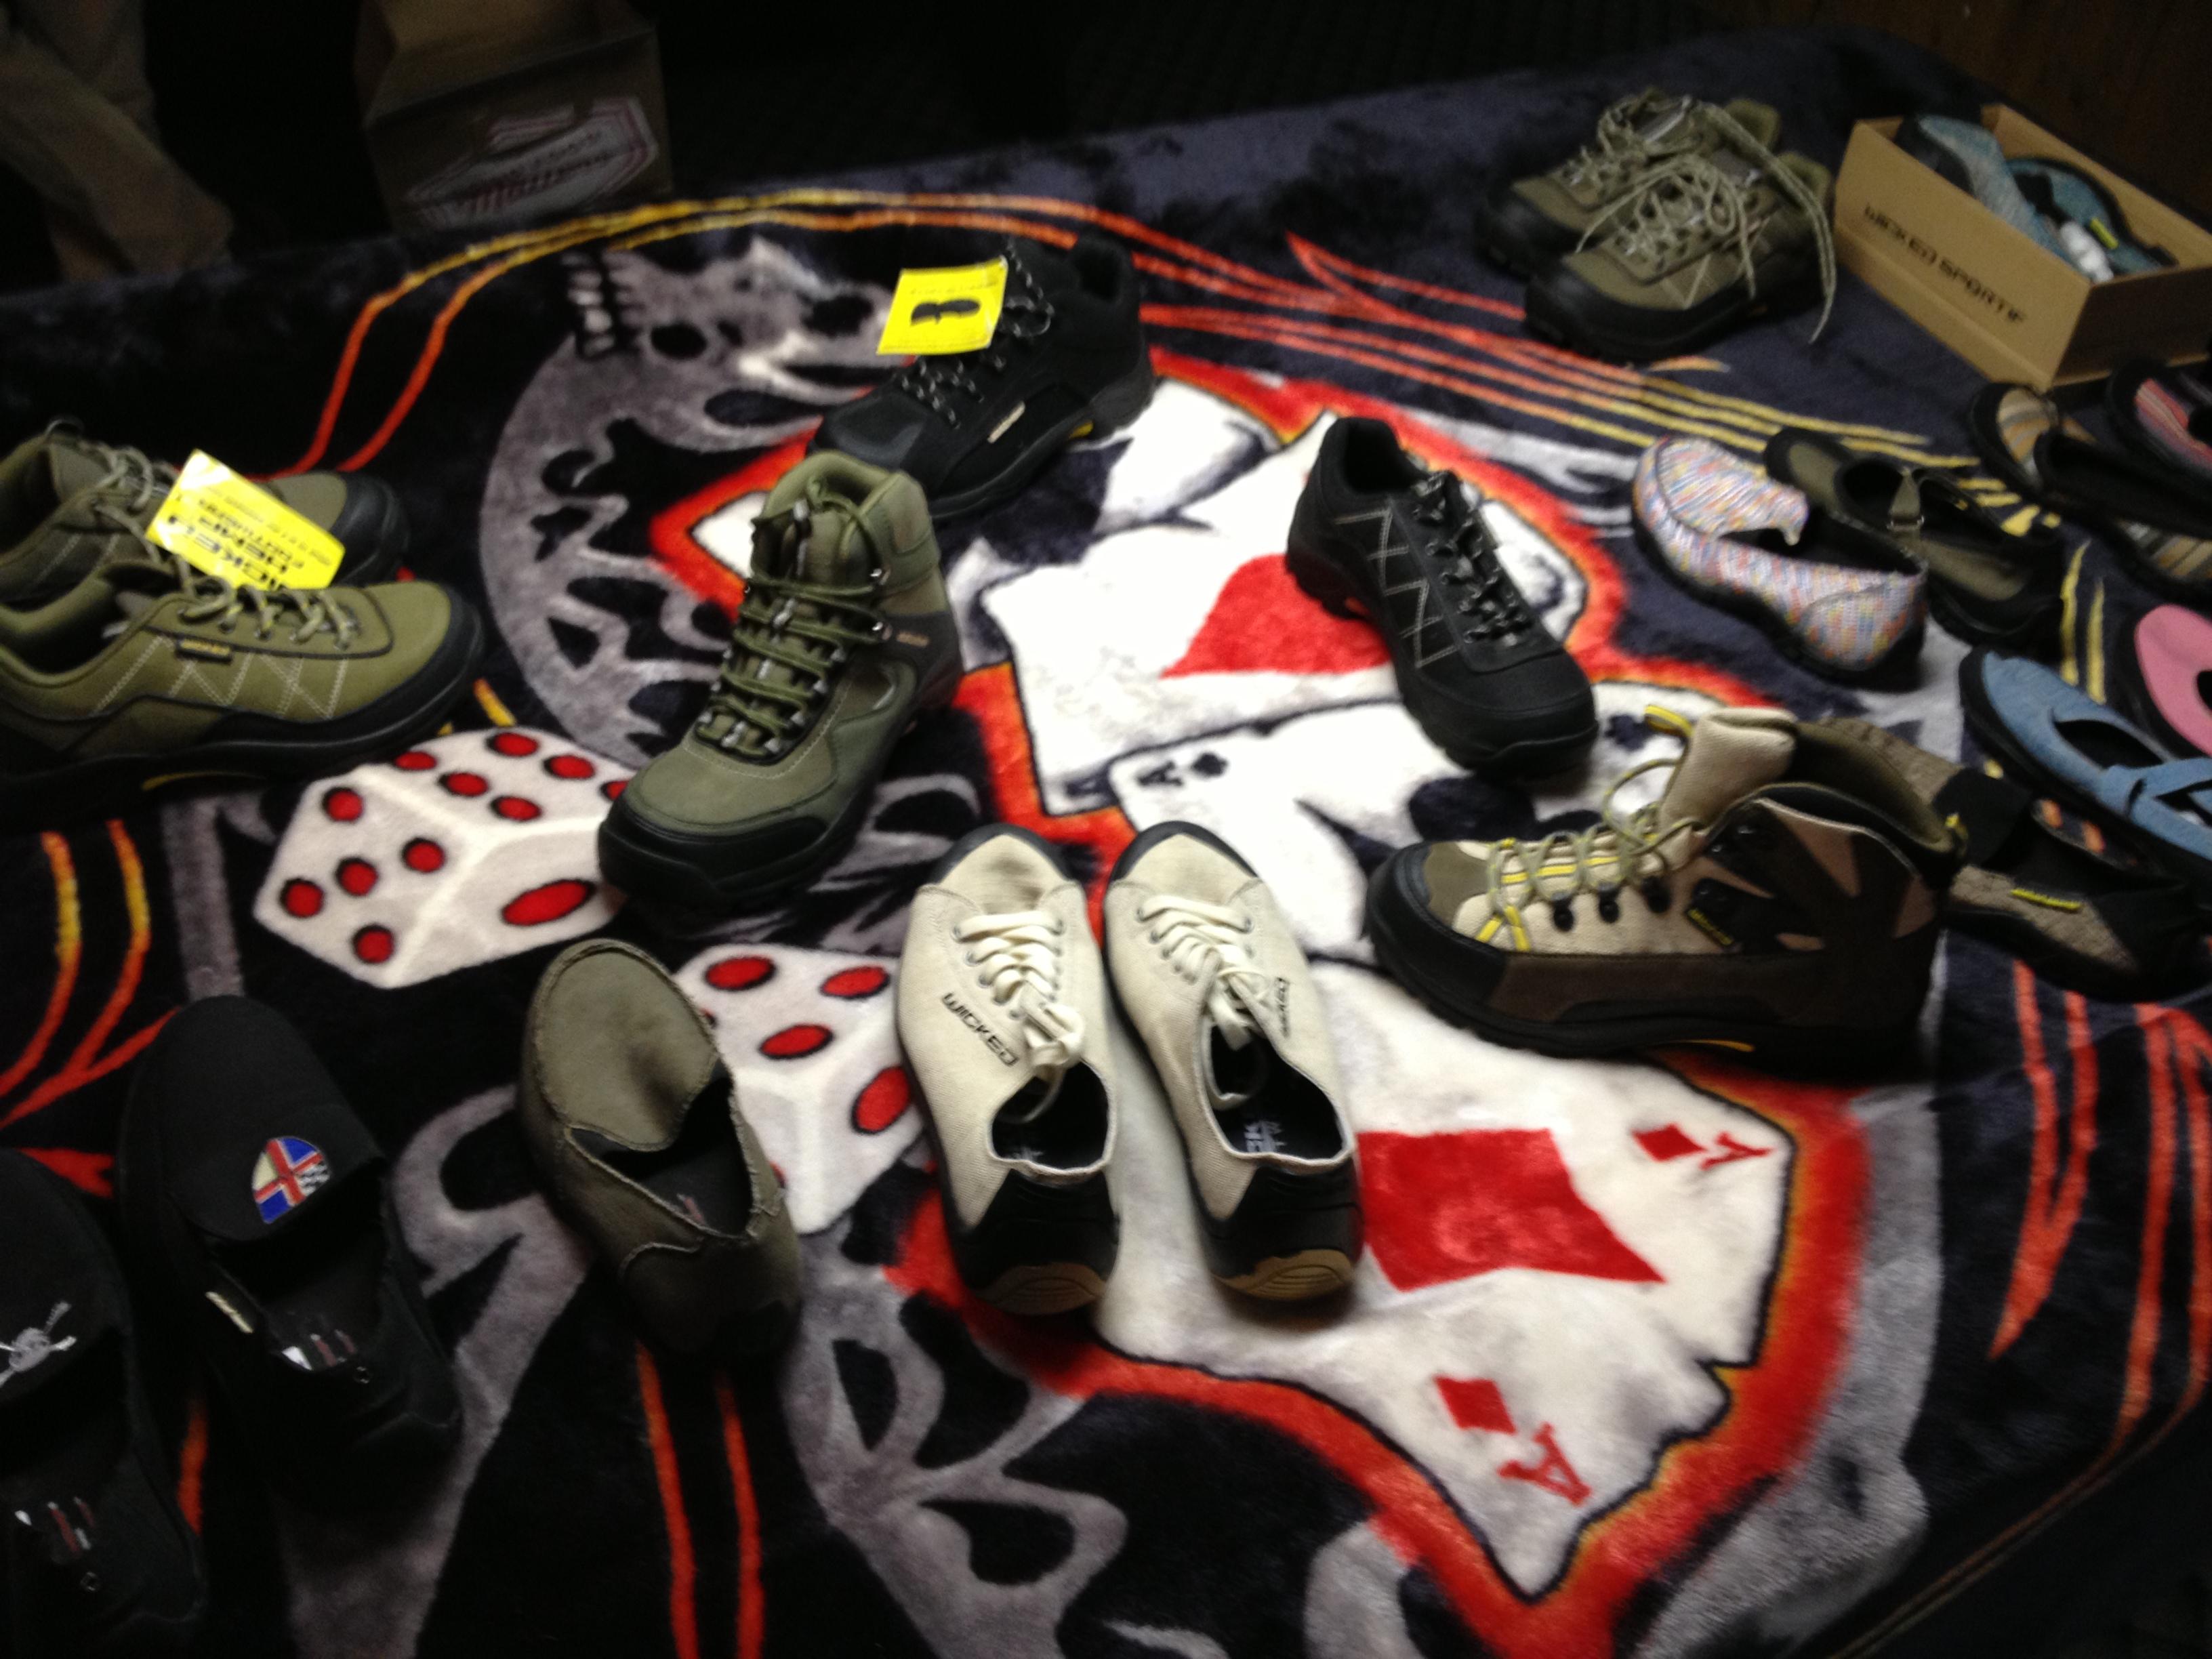 Colorado Hemp Company showcasing Hemp Shoes!